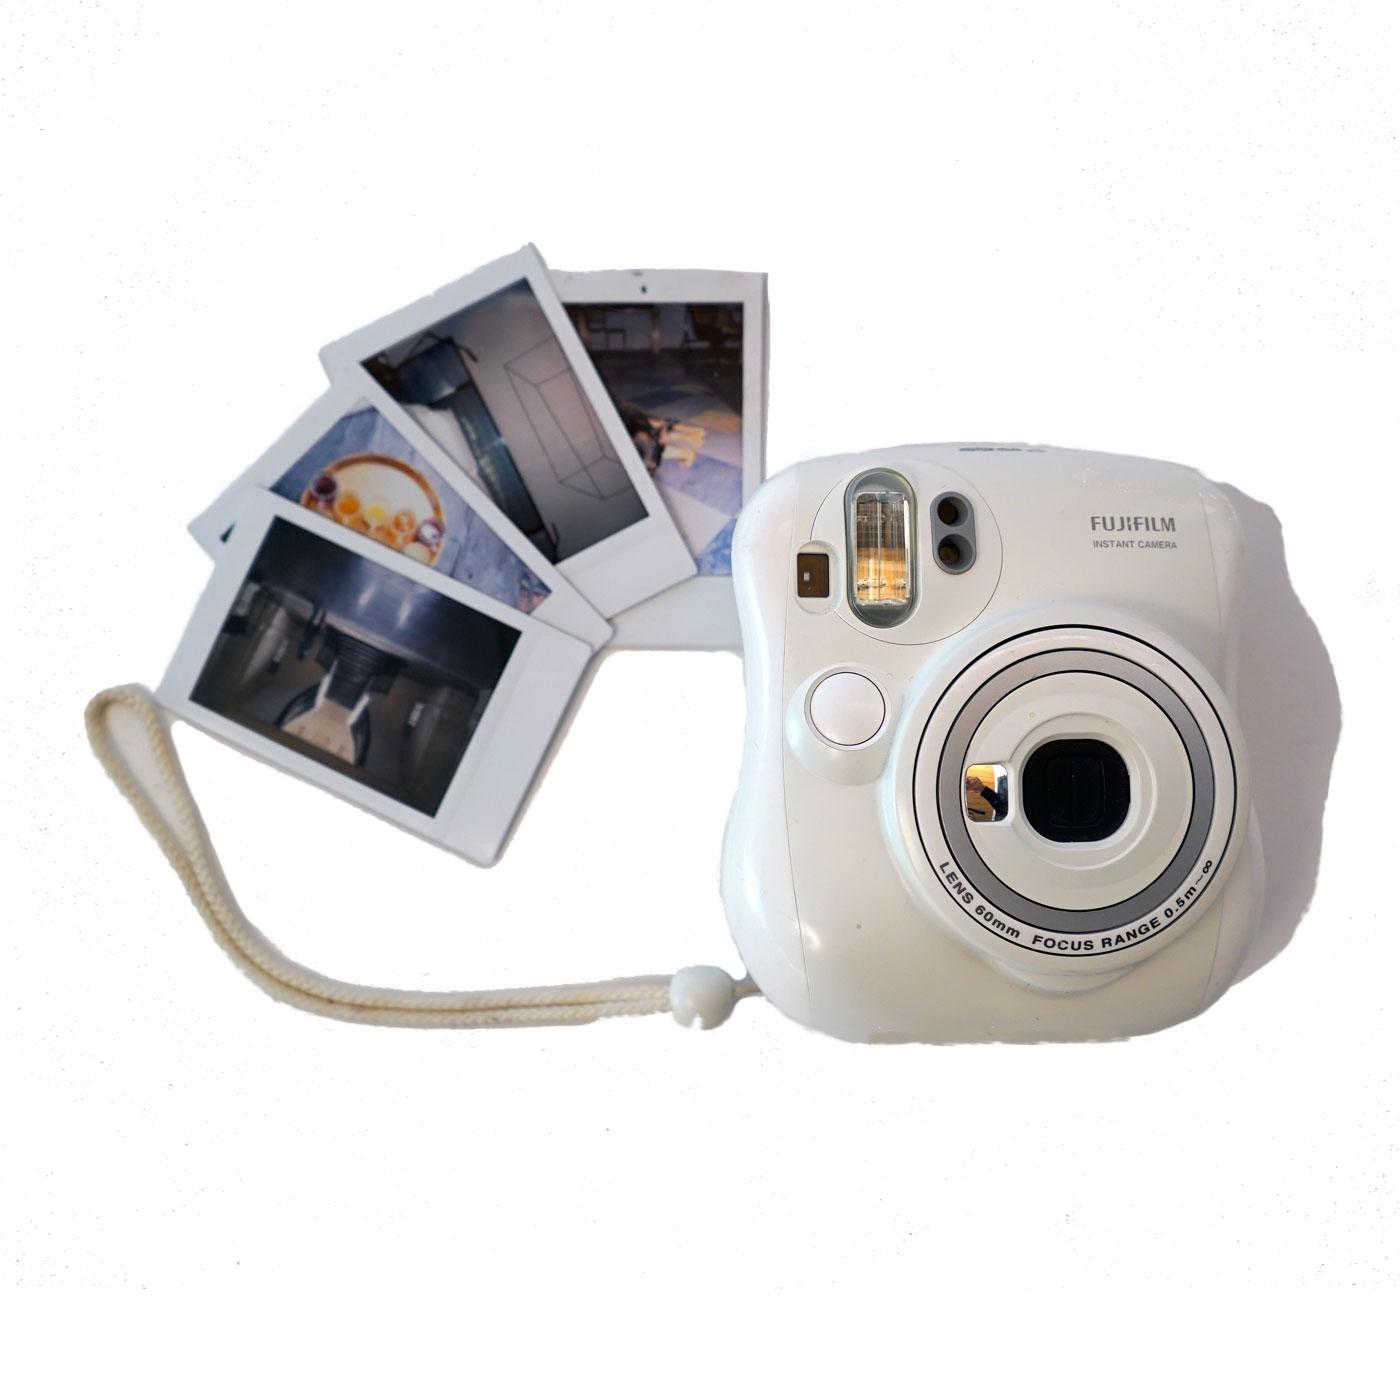 FUJI • Instax Camera • 69 USD